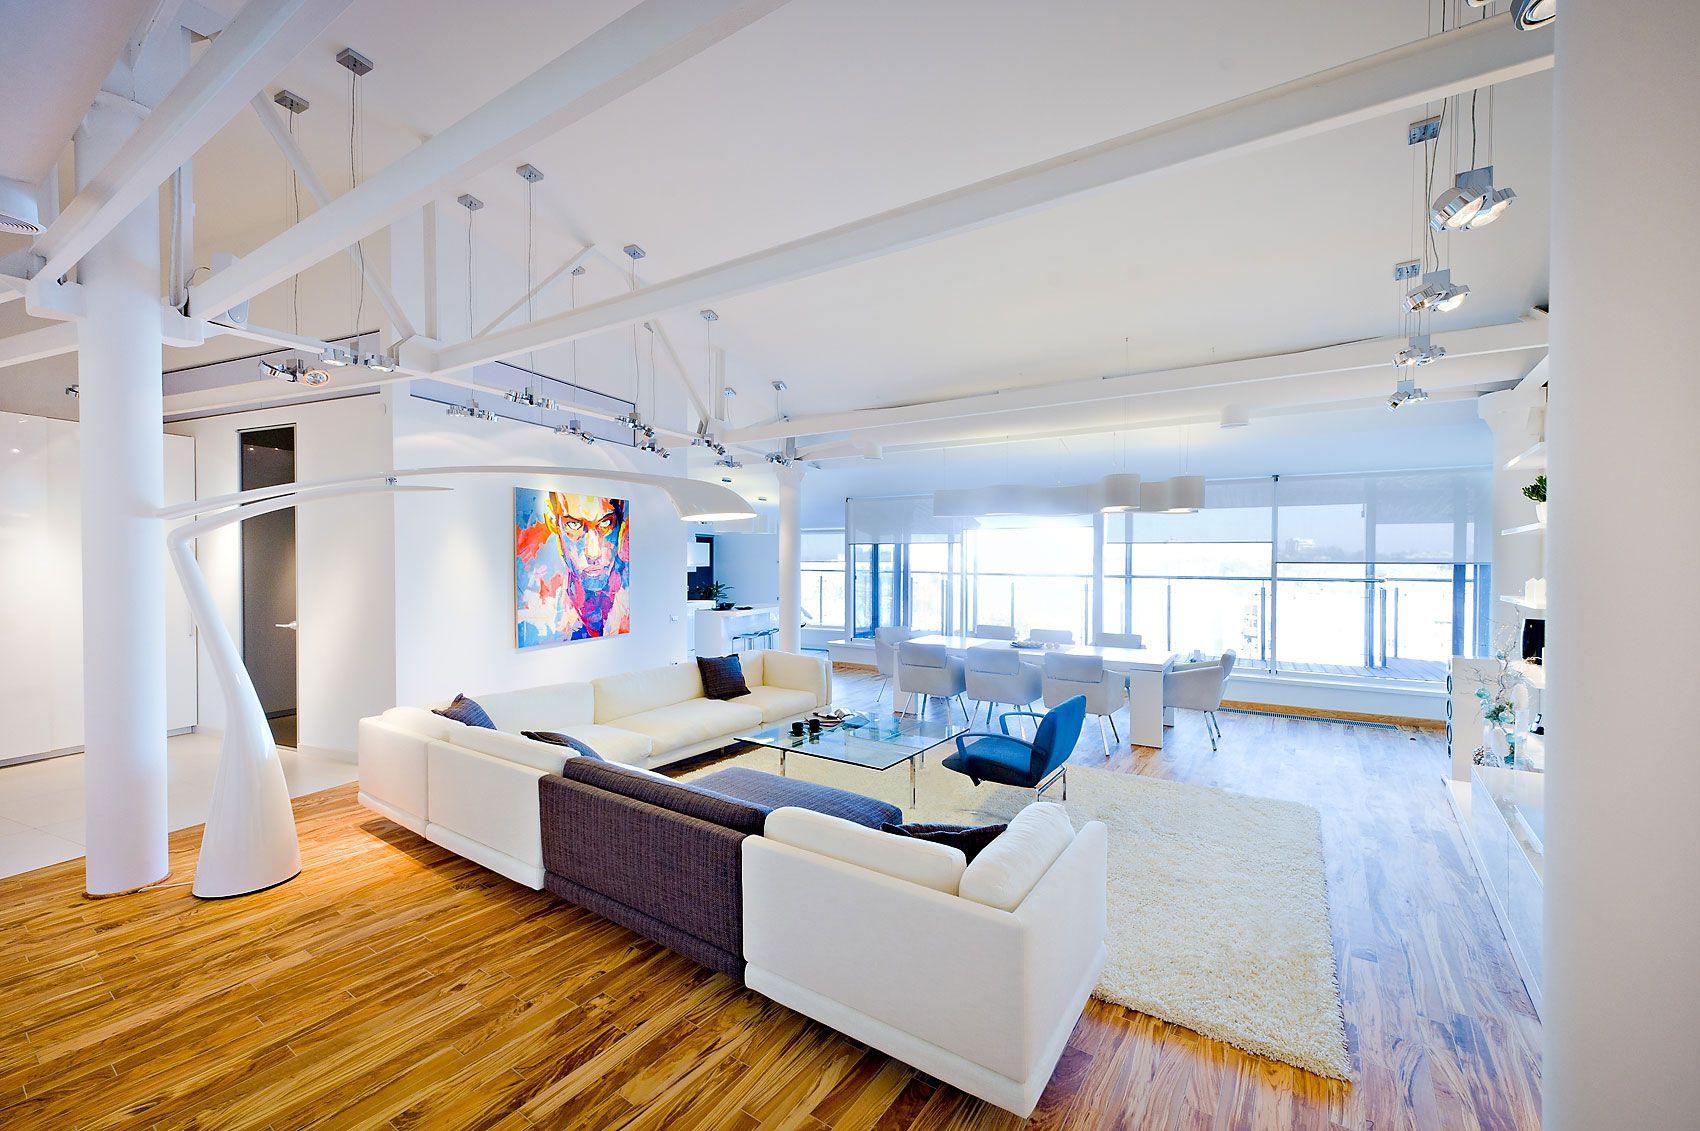 Loft Apartment In Chisinau By Grosu Art Studio Caandesign Architecture And Home Design Blog